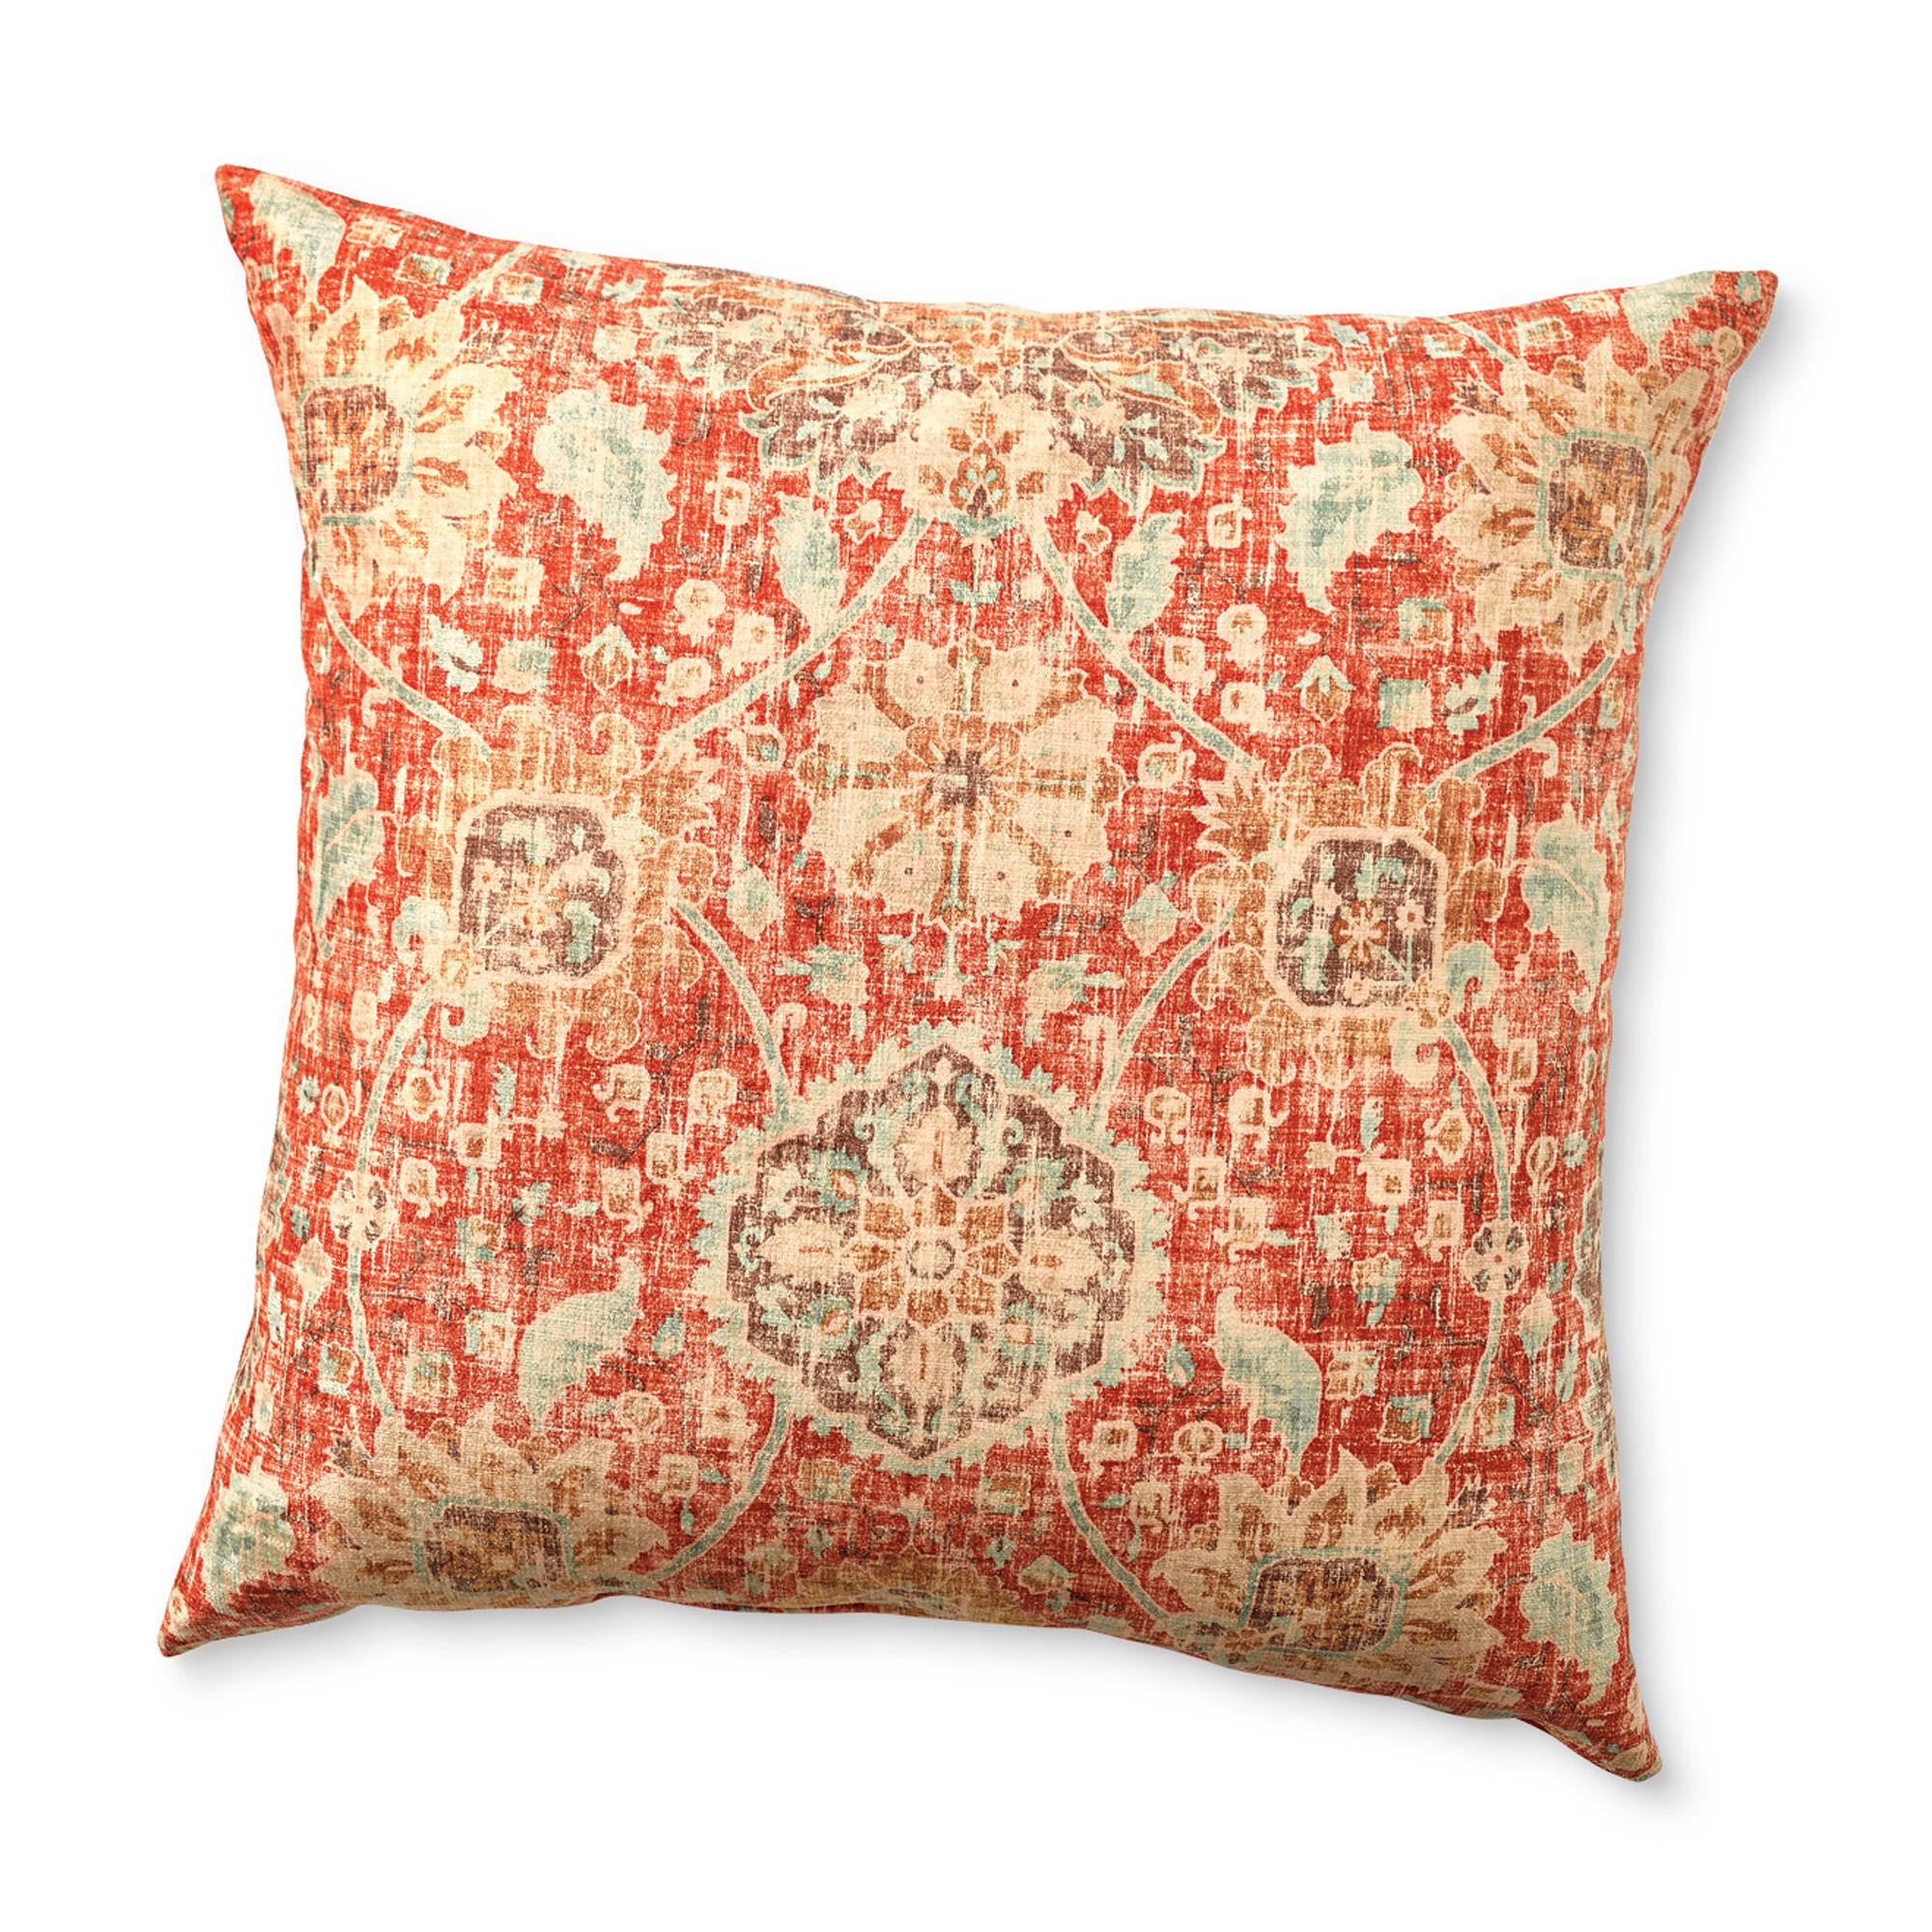 Throw Pillows Home : Rajah Velvet Pillow Gump s